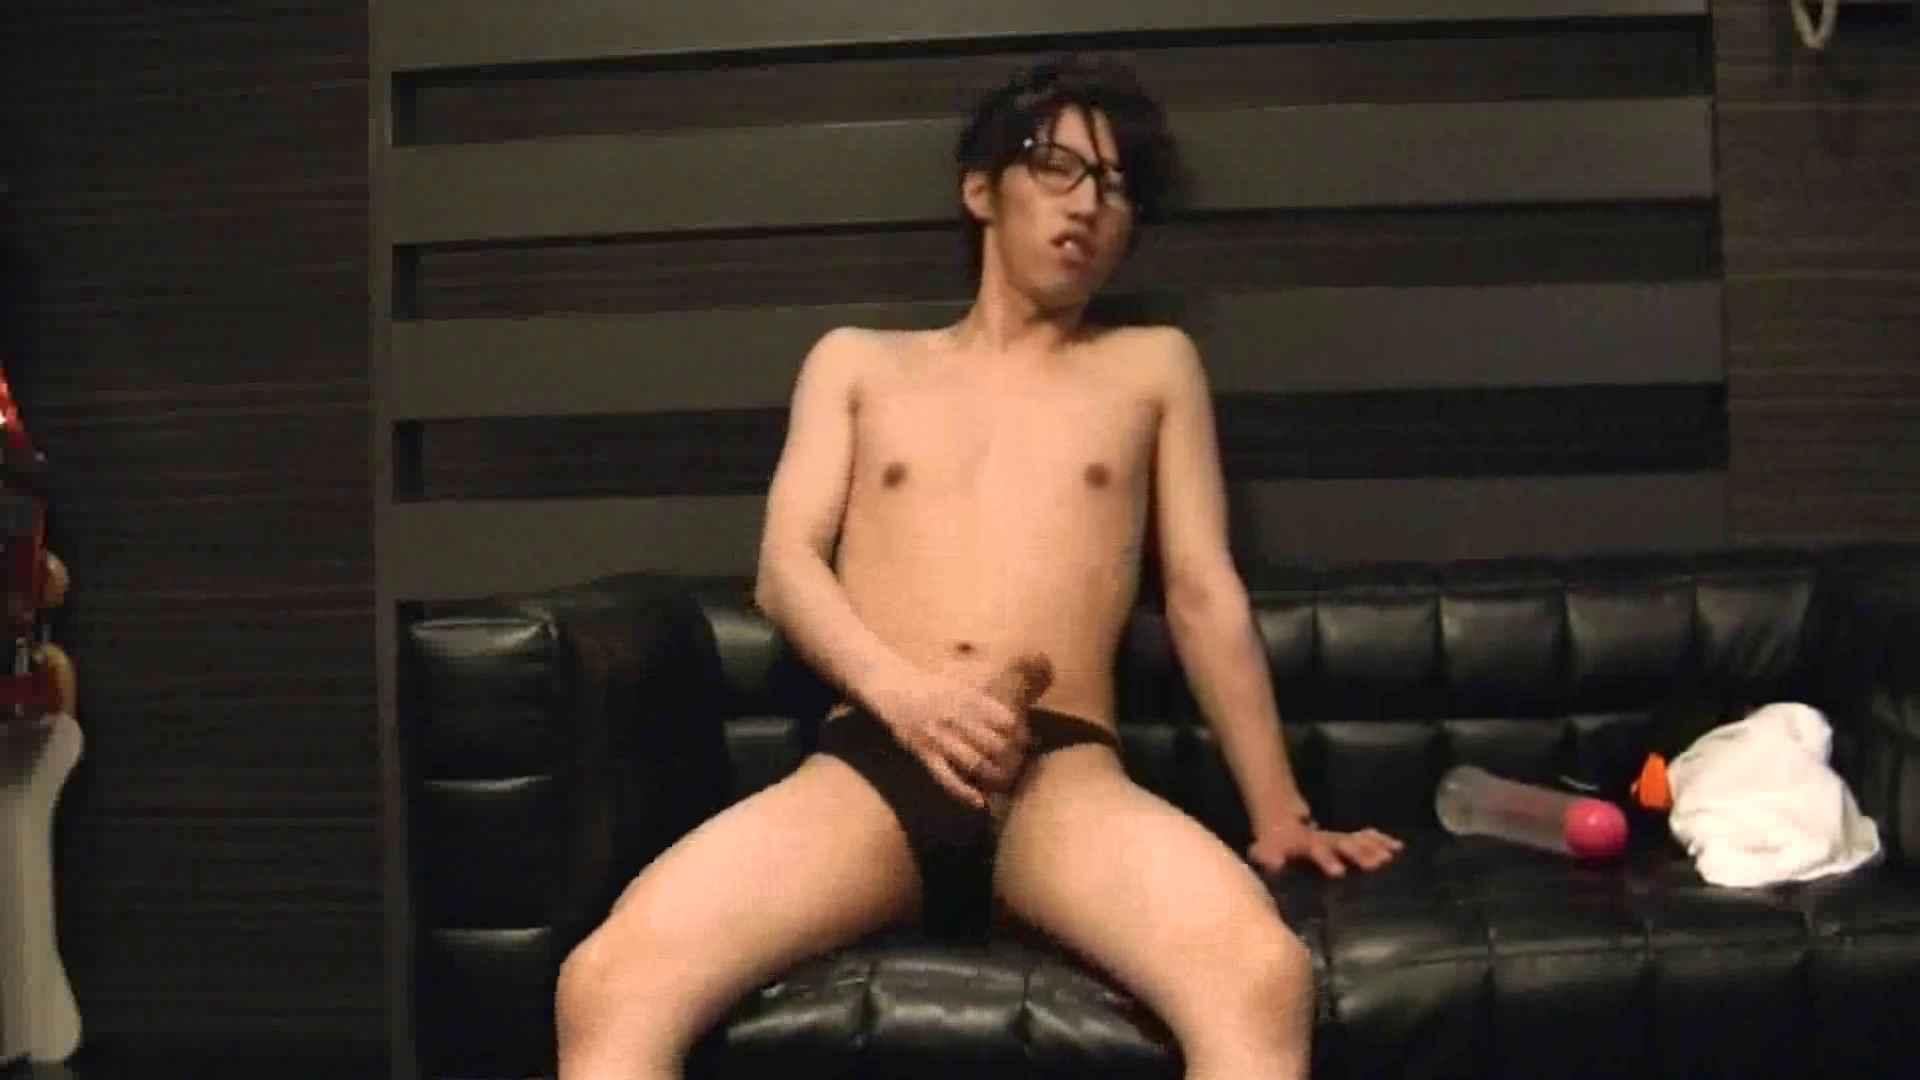 ONA見せカーニバル!! Vol3 男 ゲイ無料無修正画像 89枚 65